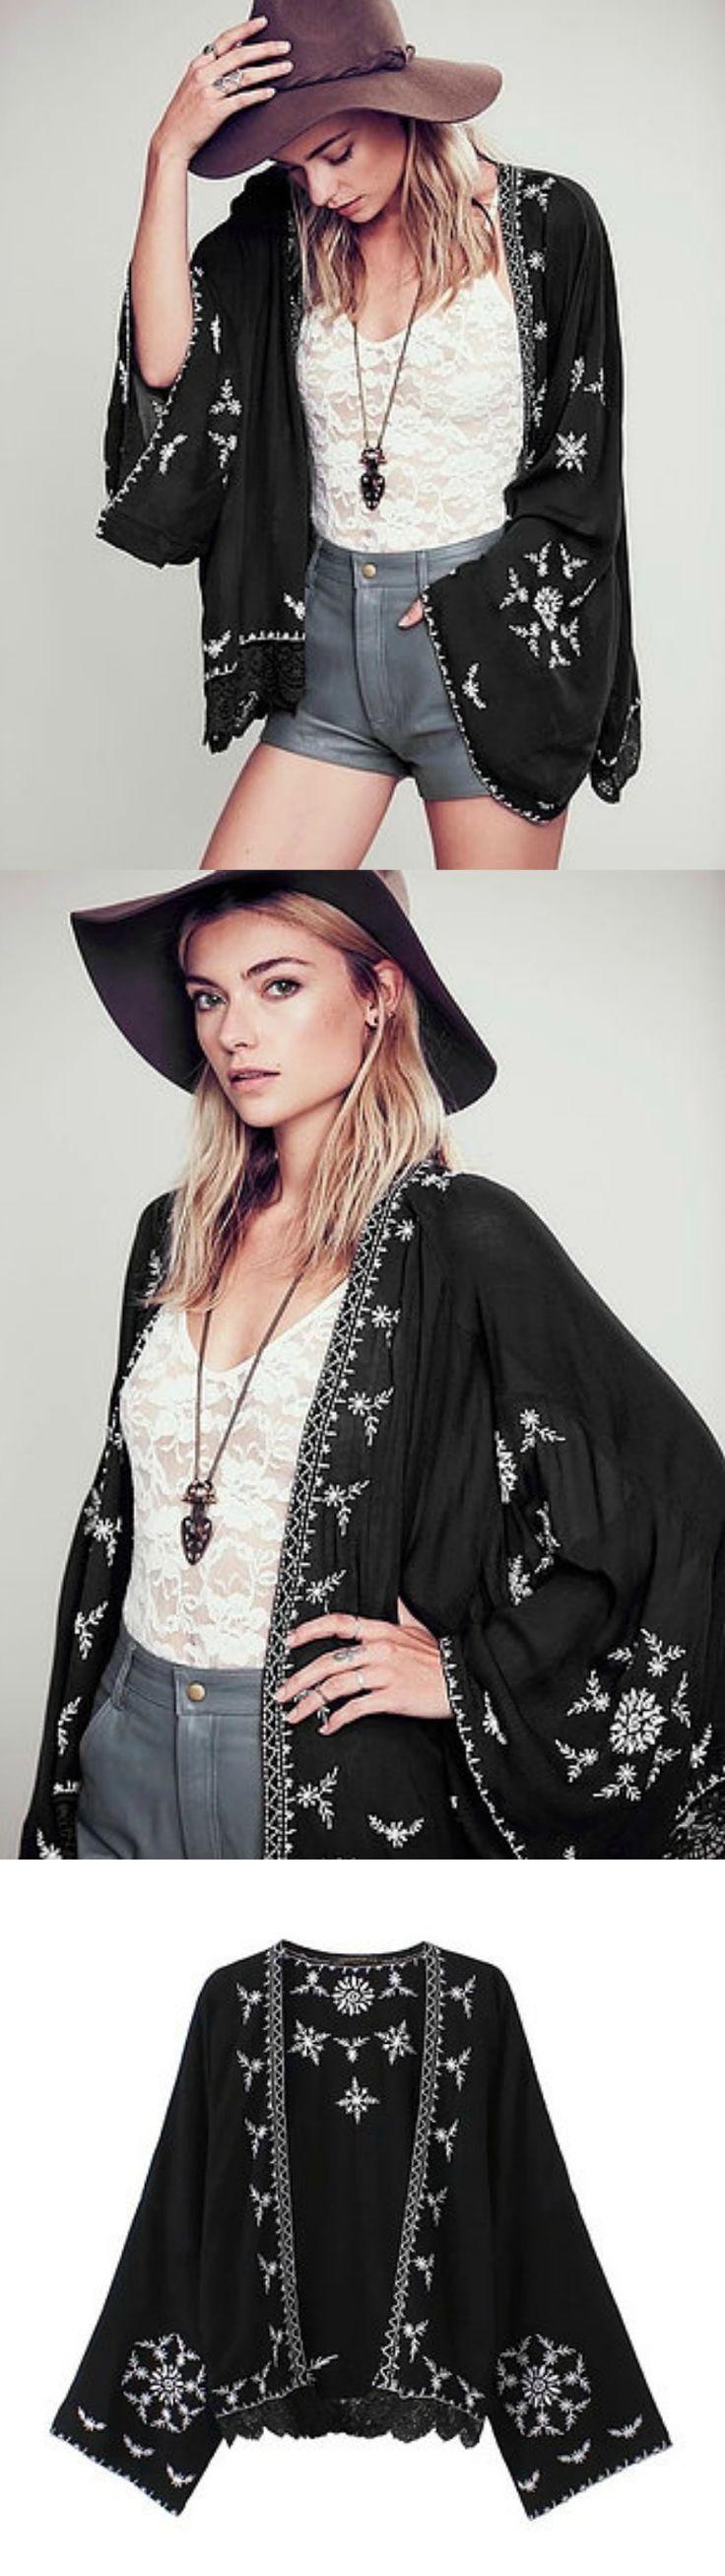 Black Kimono Cardigan is Available at Pasaboho - $35 ( Free Shipping Worldwide )